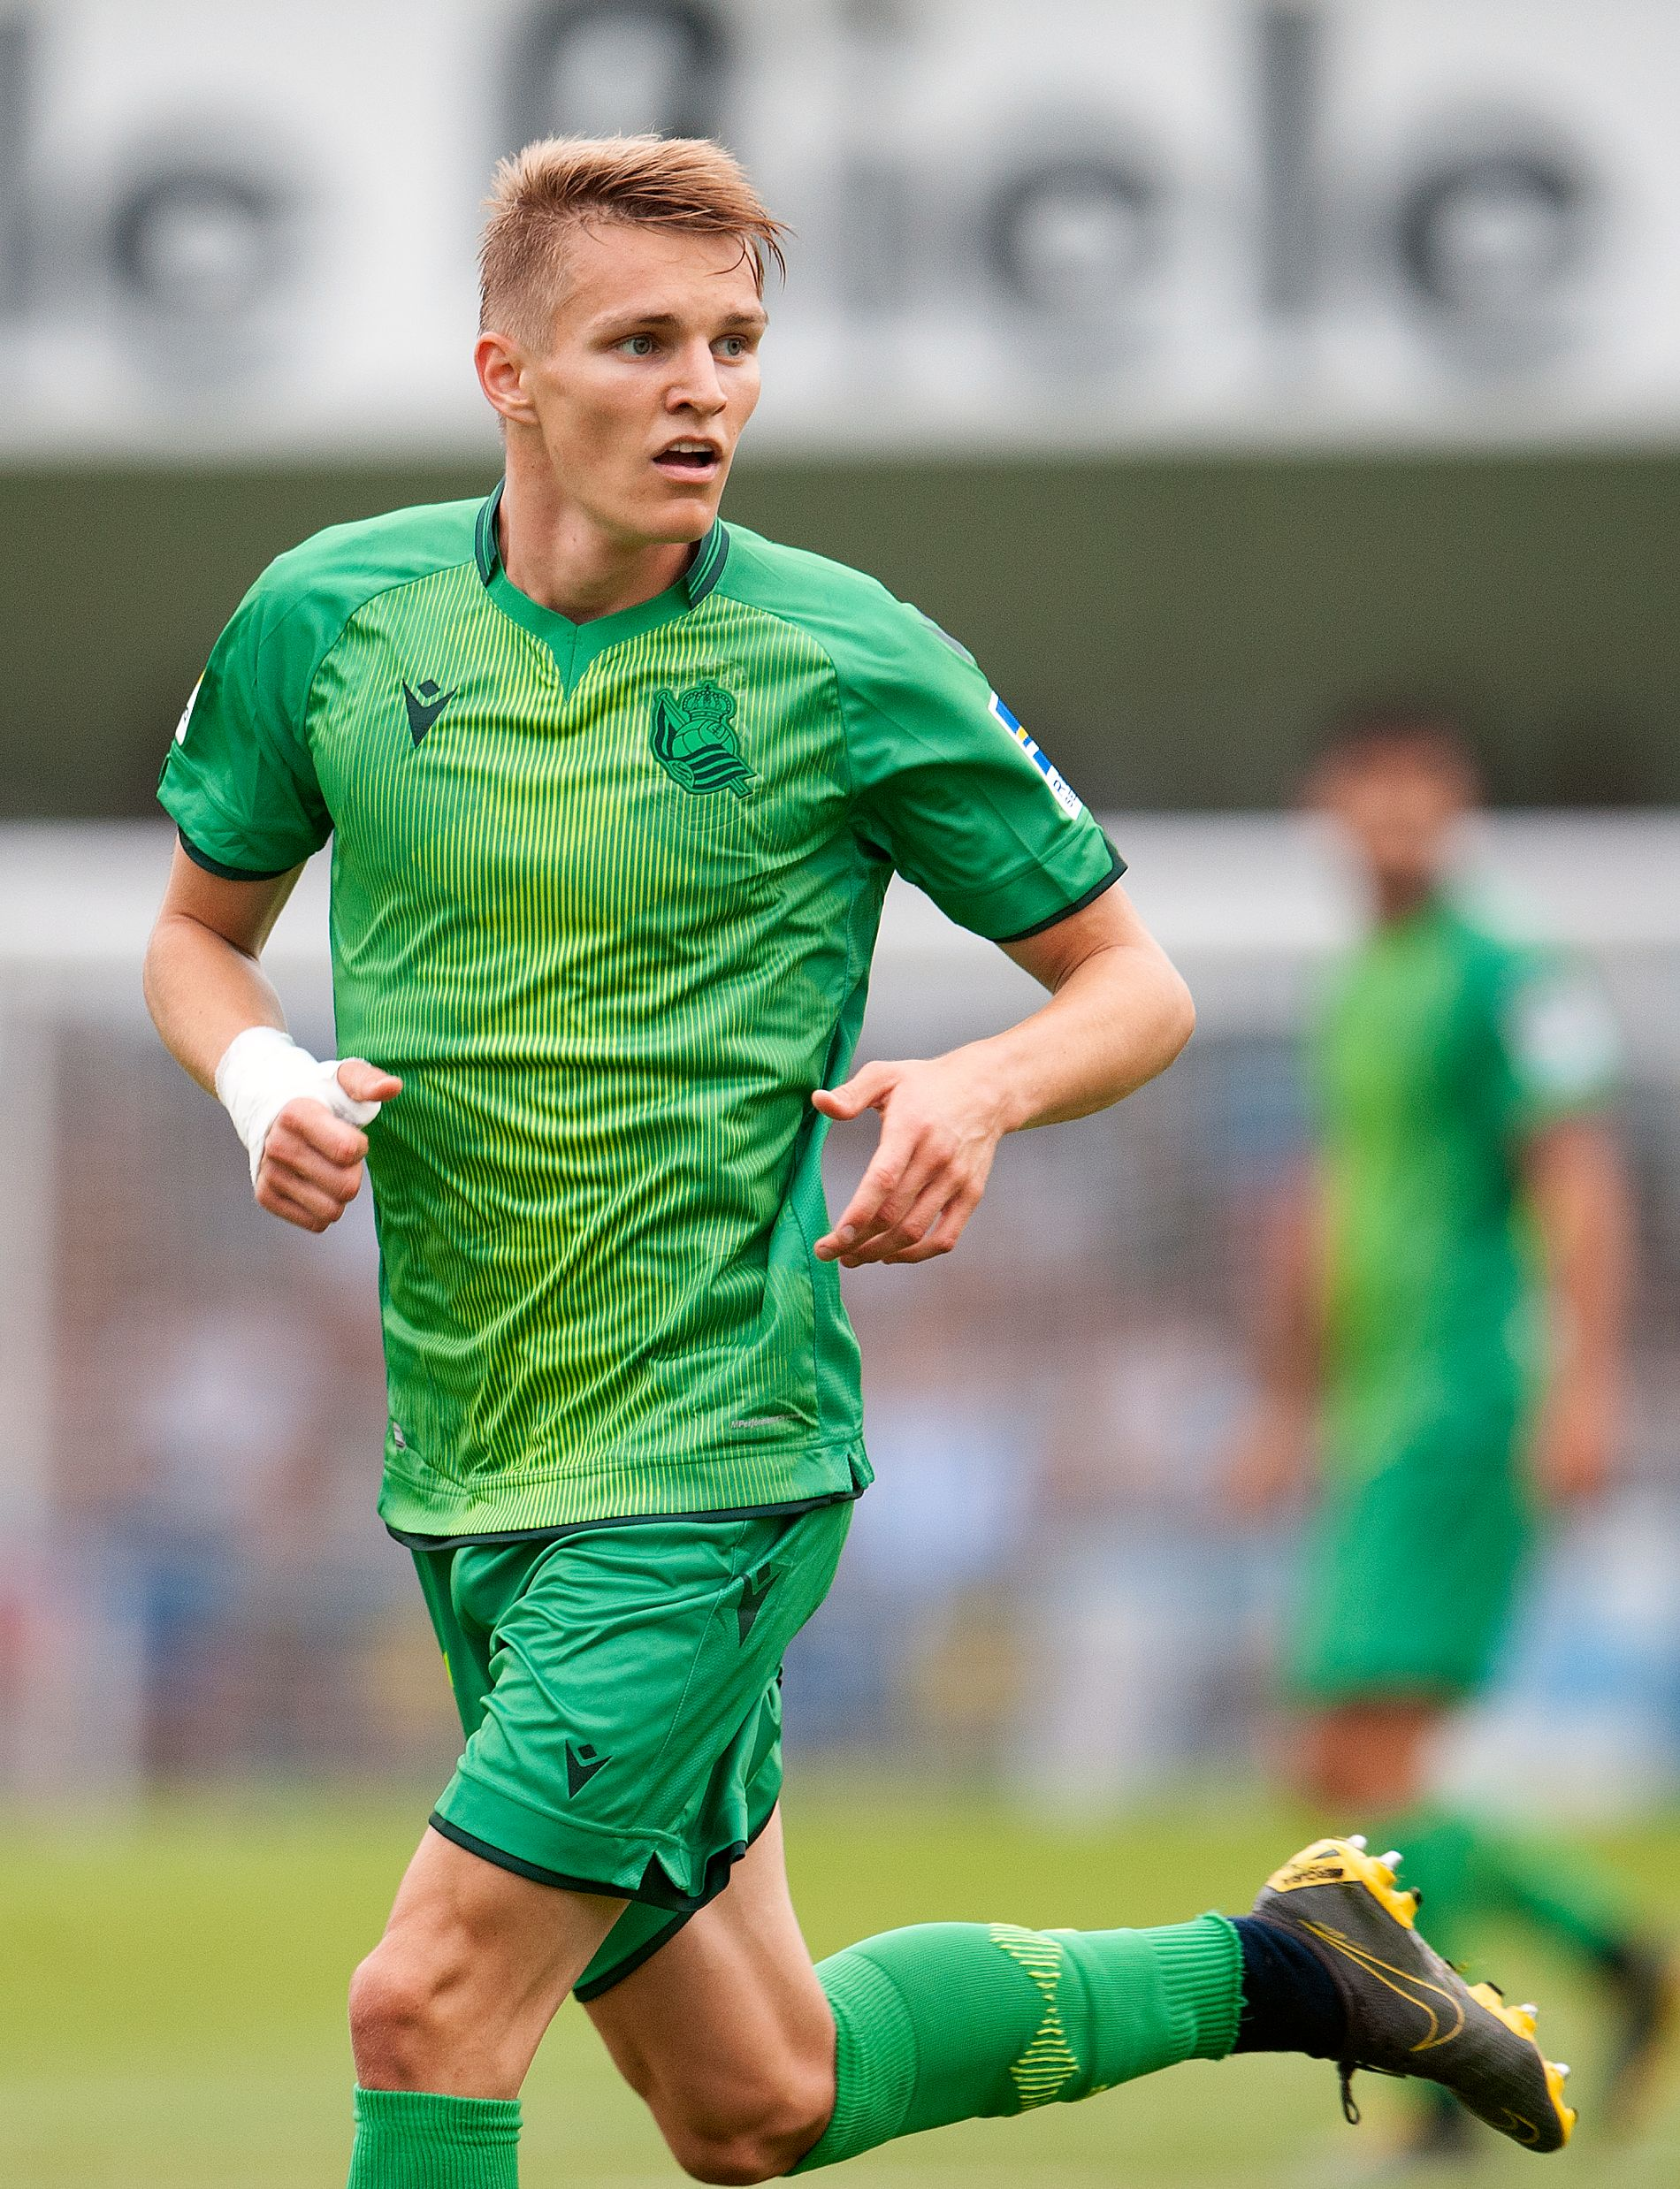 Det var stor rift rundt Martin Ødegaard før overgangen til Real Sociedad.